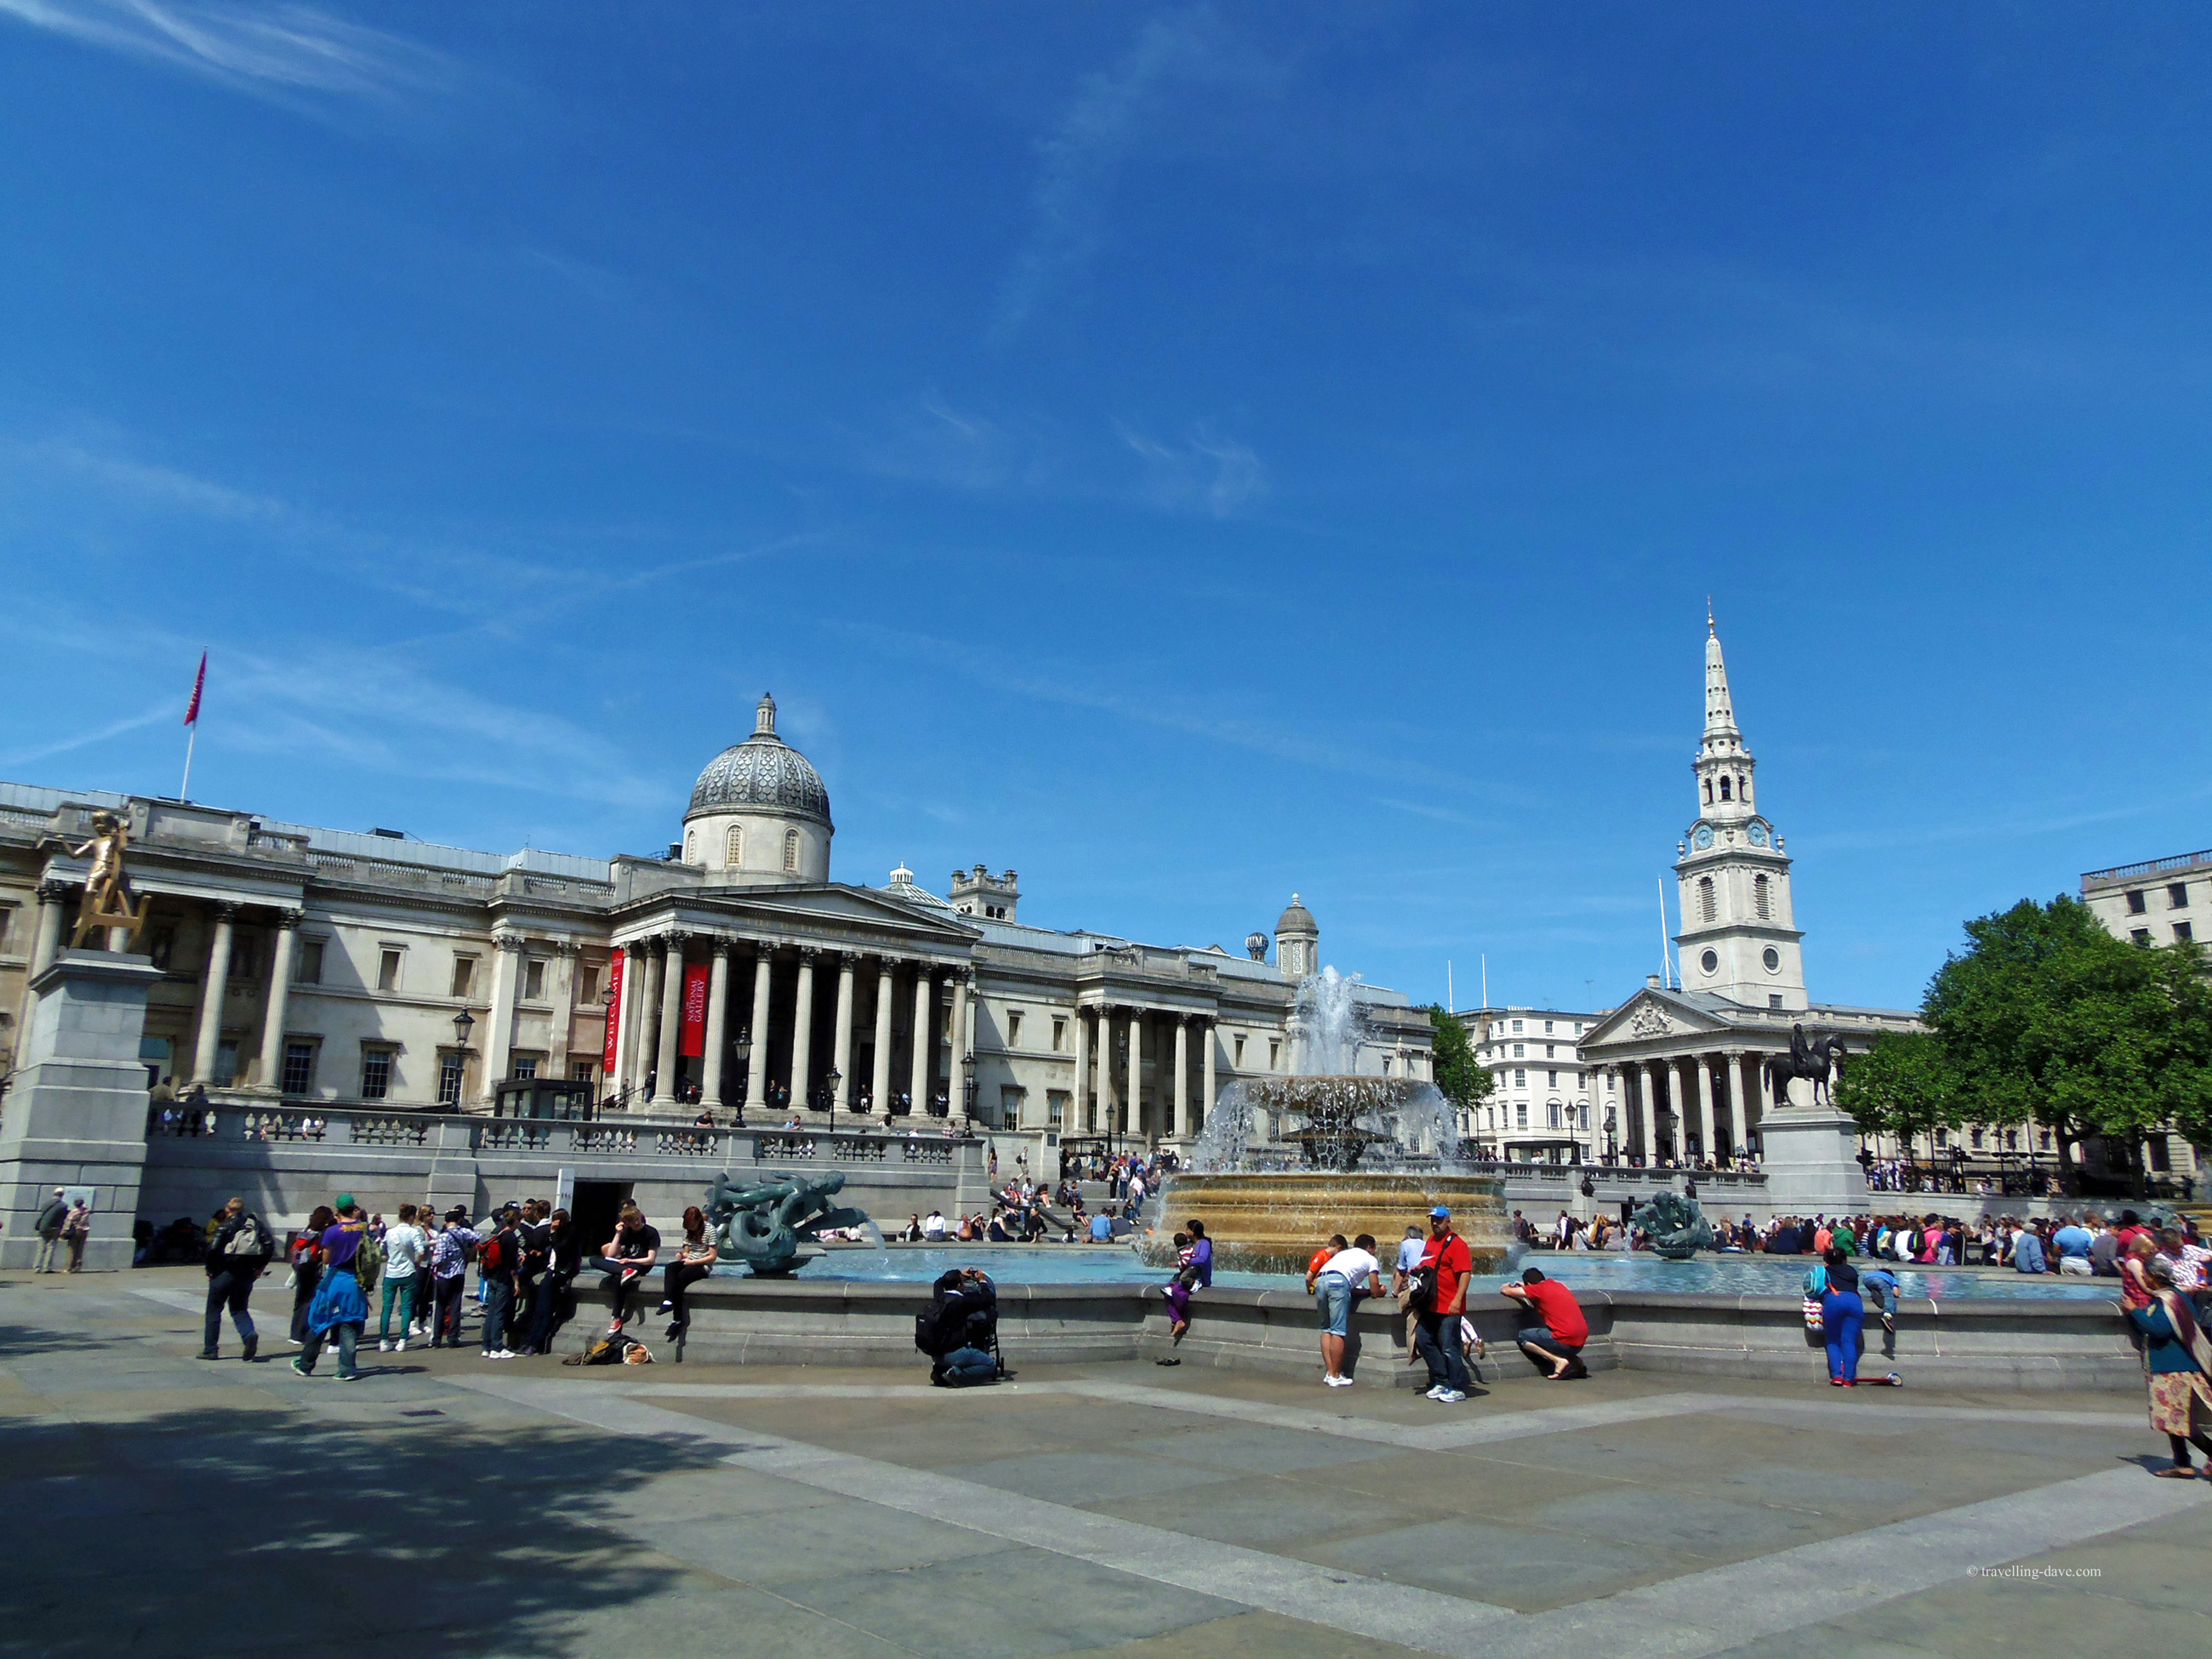 View of Trafalgar Square in London